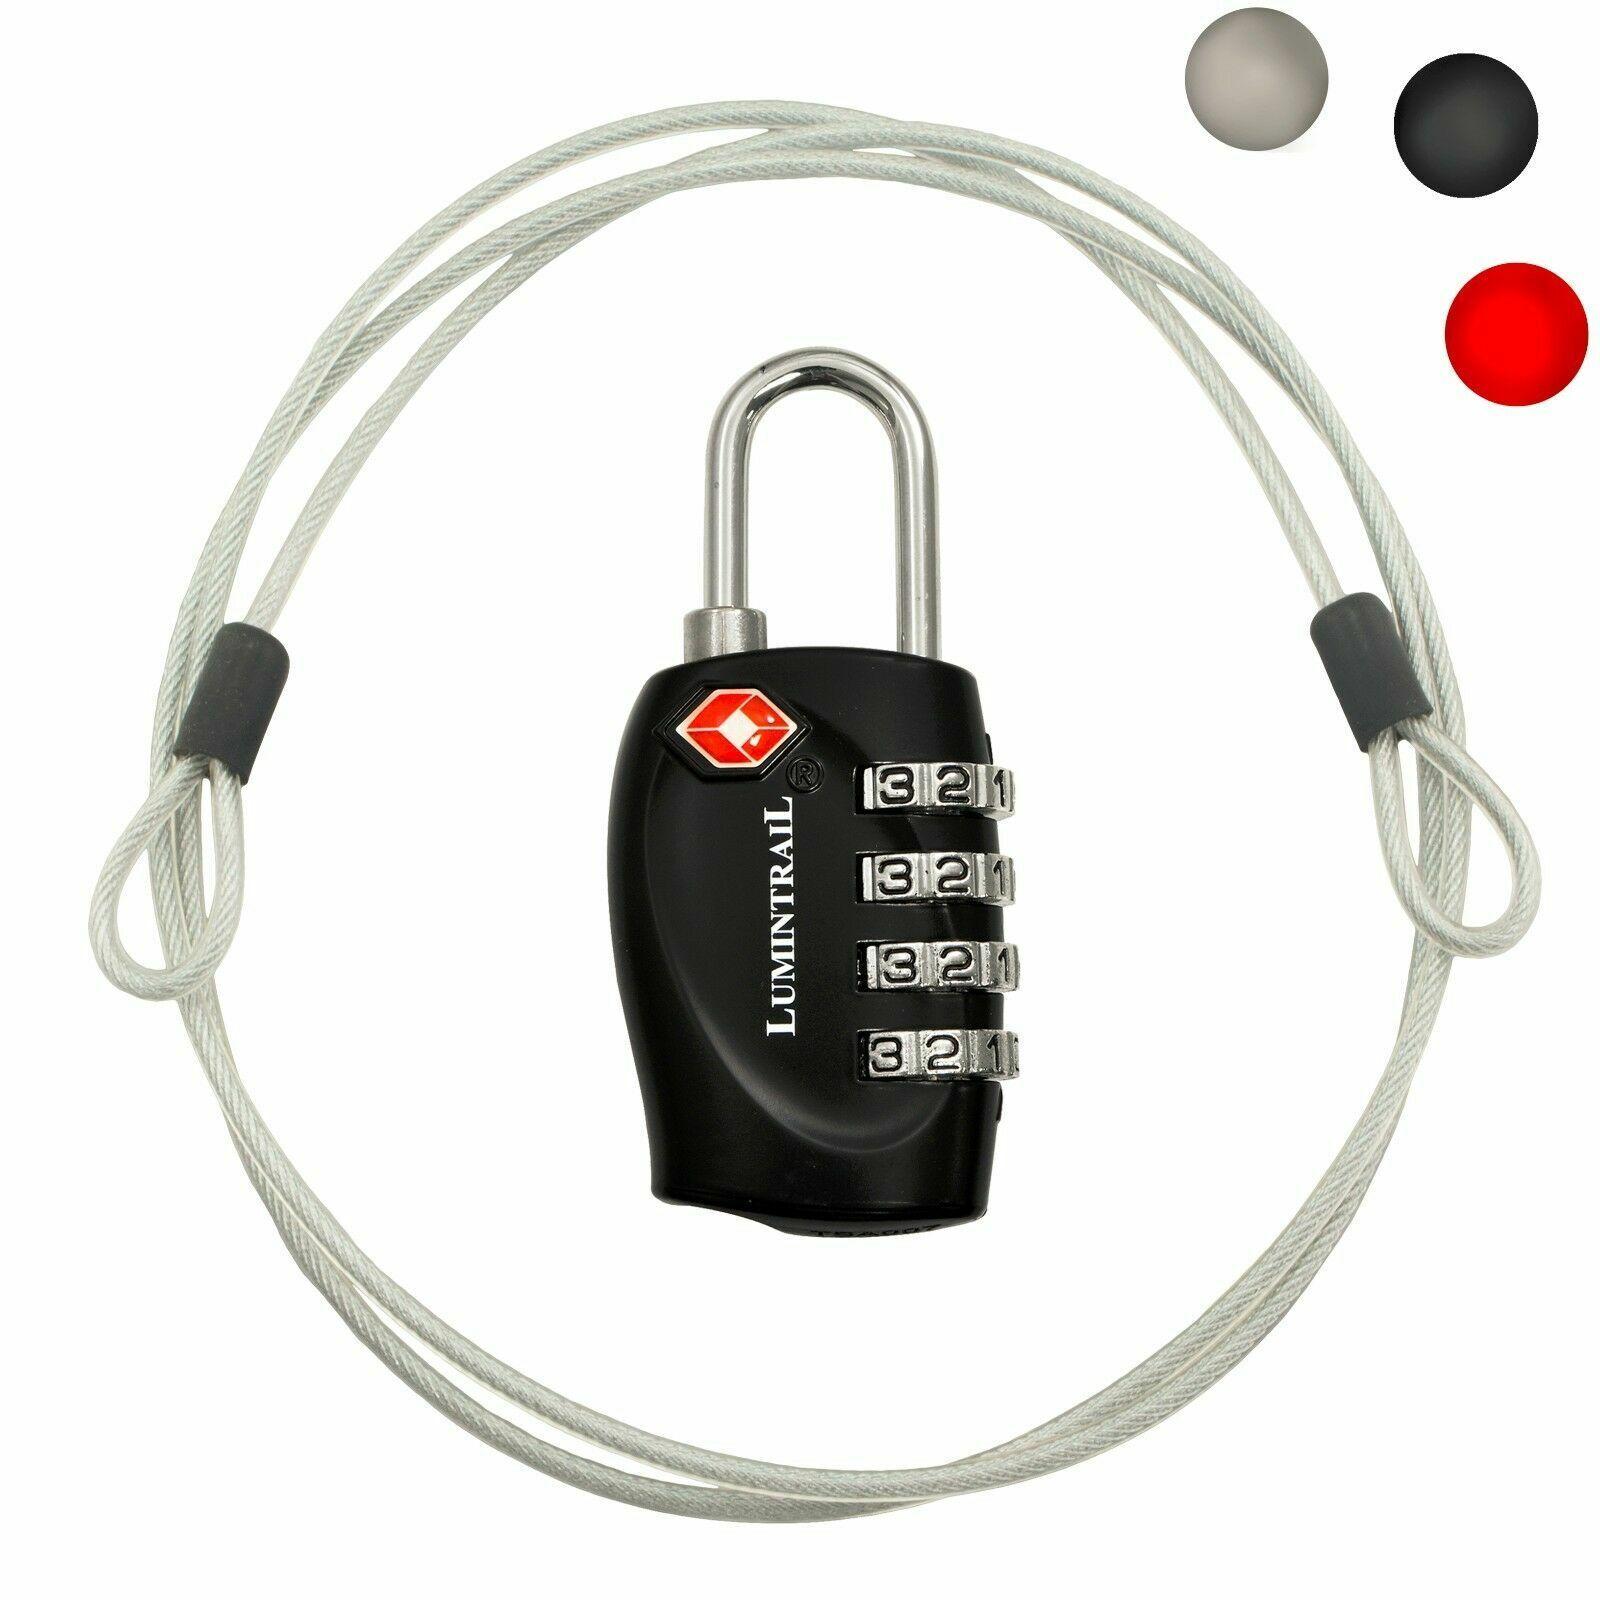 Xunbin TSA Lock Combination Padlock 2 Pack 3-Digit Combination Security Cable Padlock-Suitcase Cable Lock TSA Luggage Locks Special Alloy RED